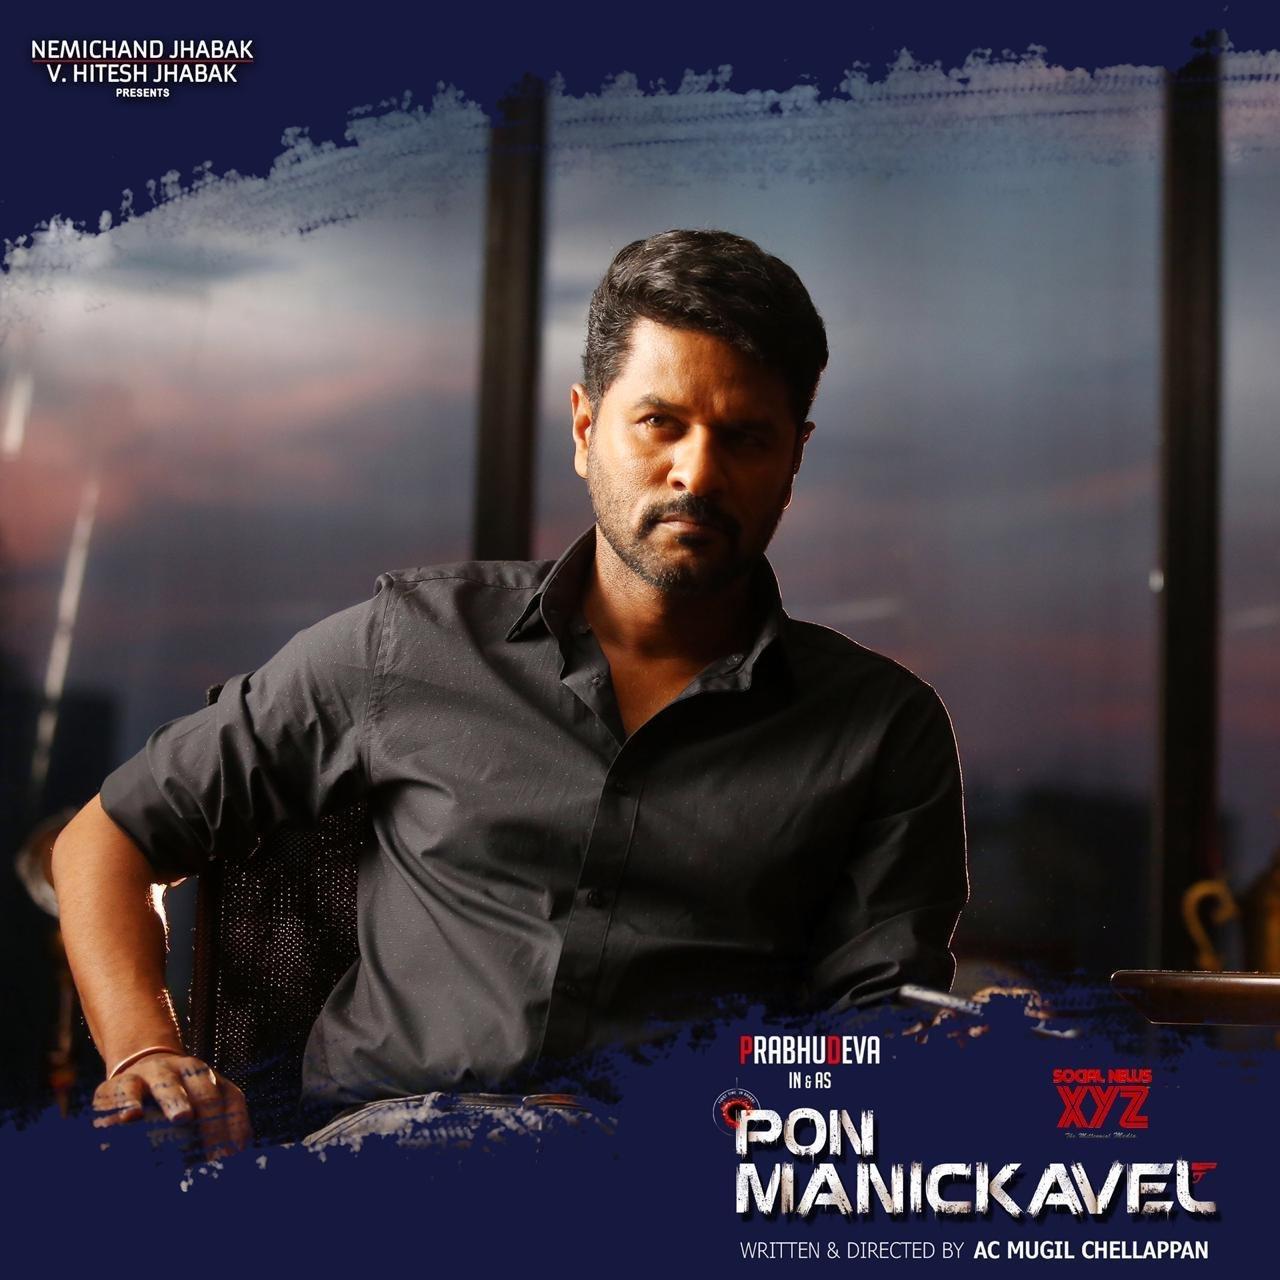 Pon Manickavel TamilRockers